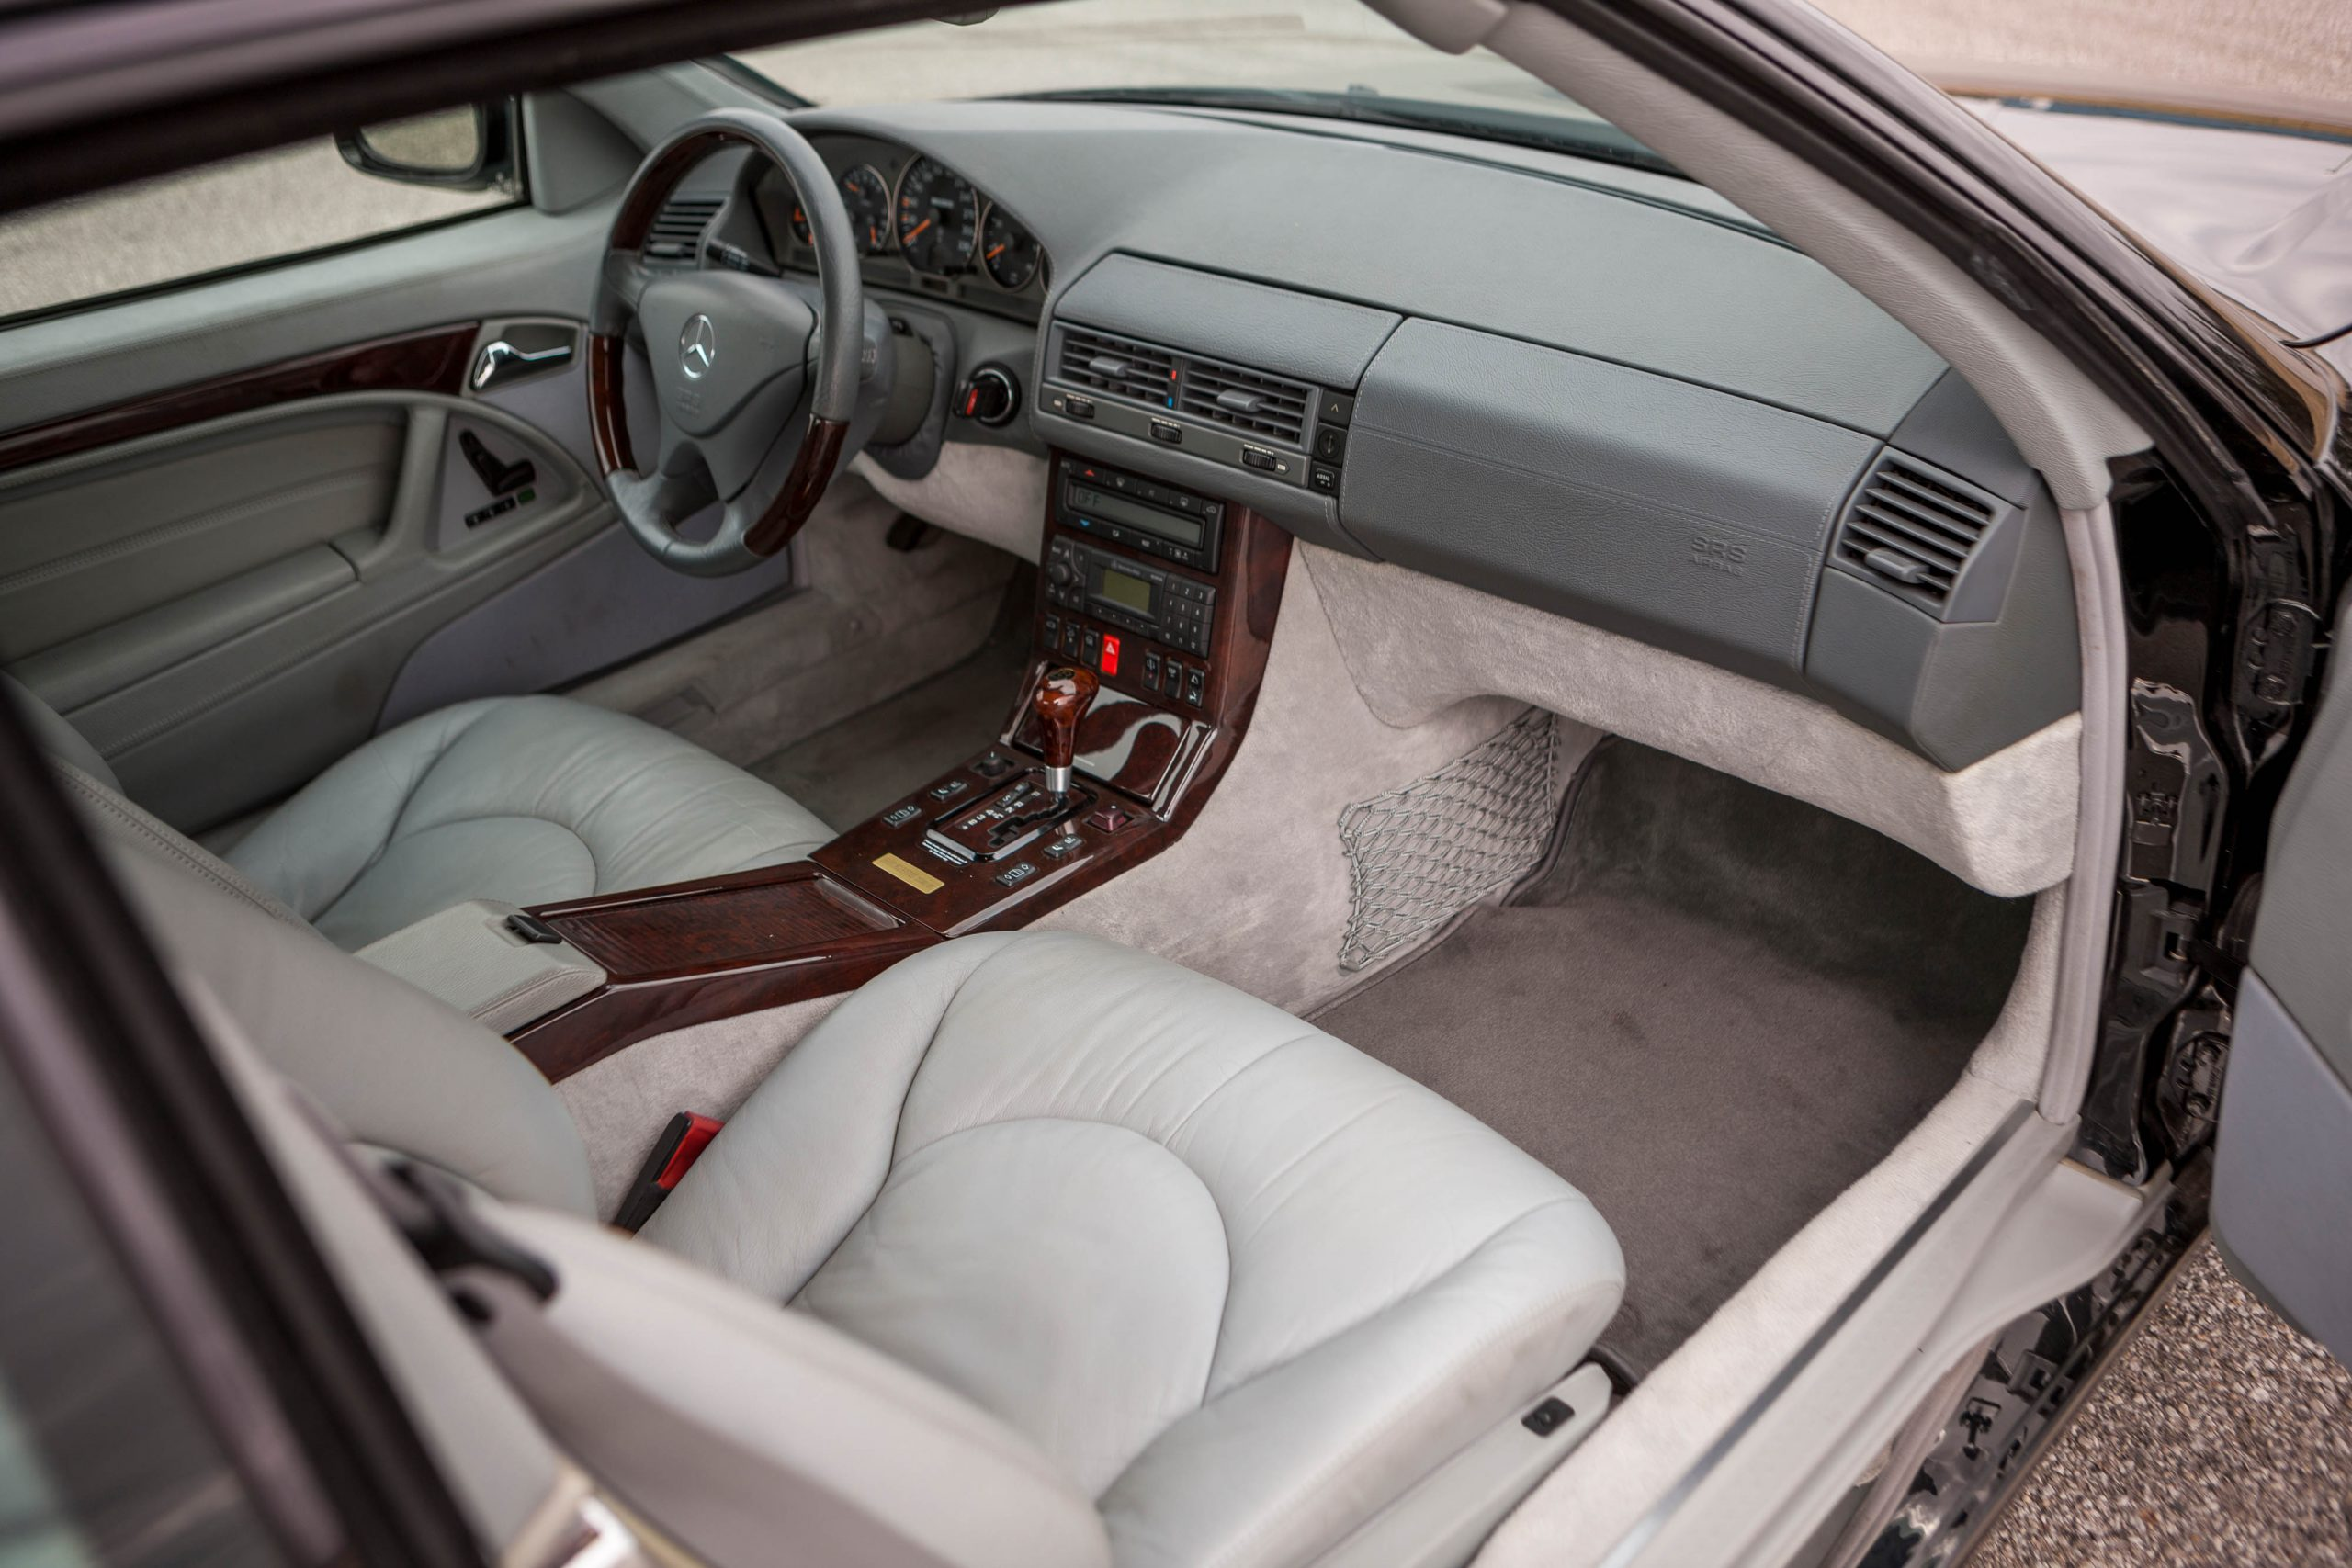 1999 Mercedes-Benz Brabus 7.3 S interior